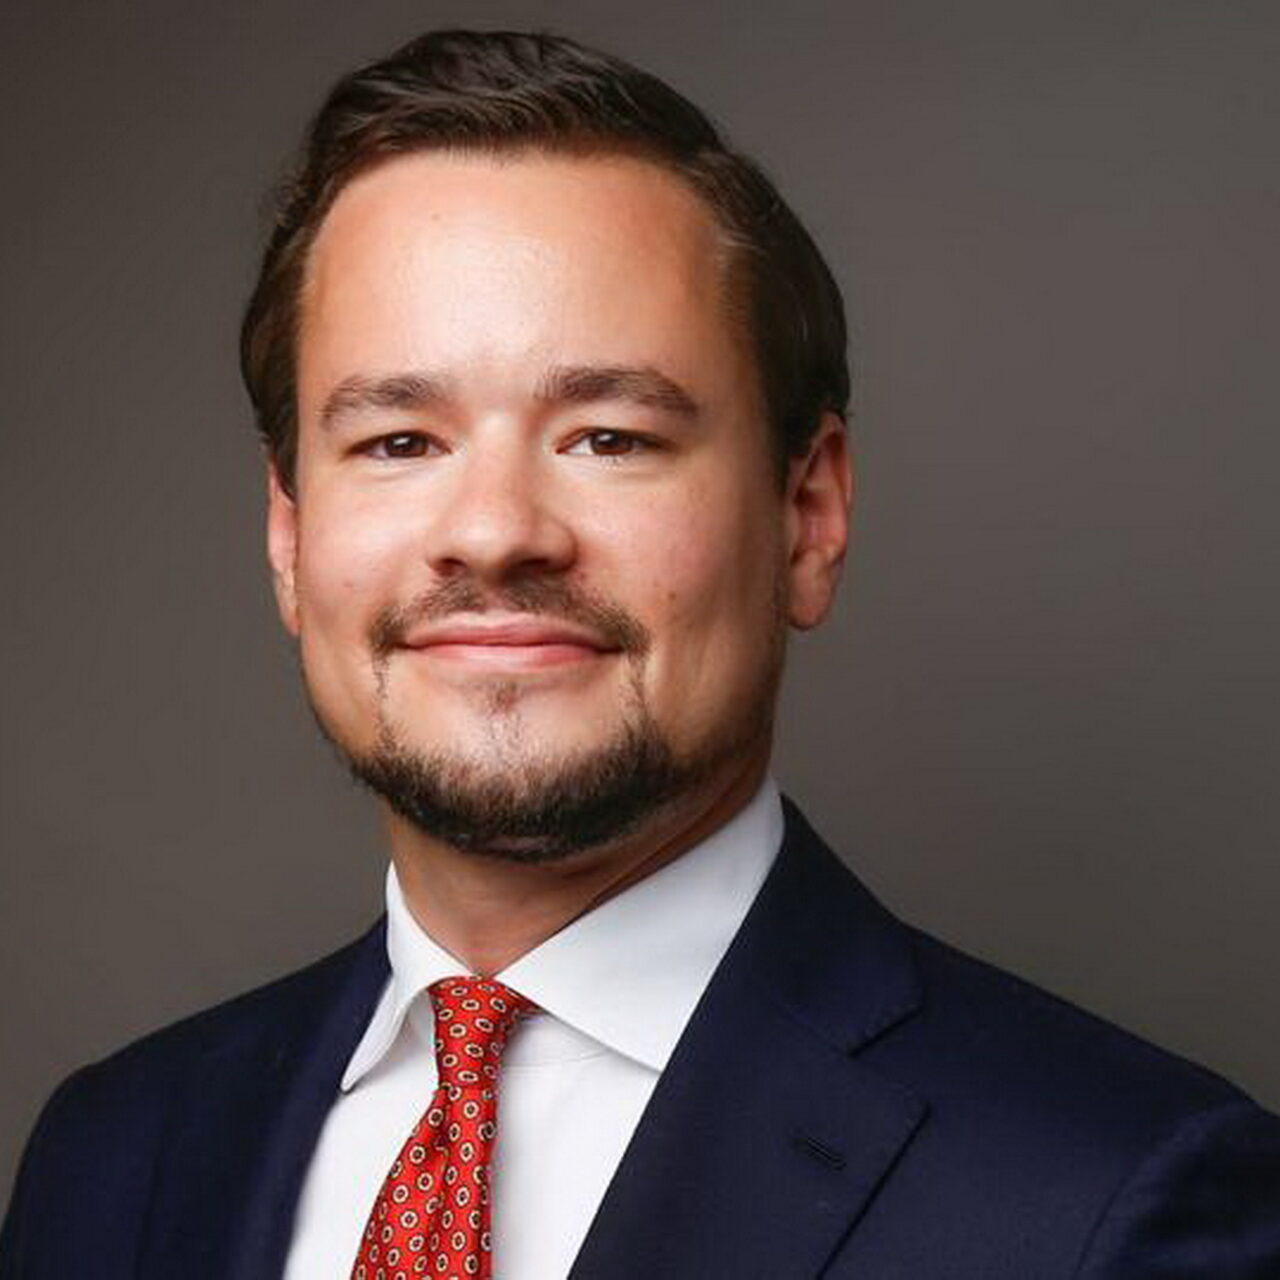 H&A mit neuem Head of Digital Assets